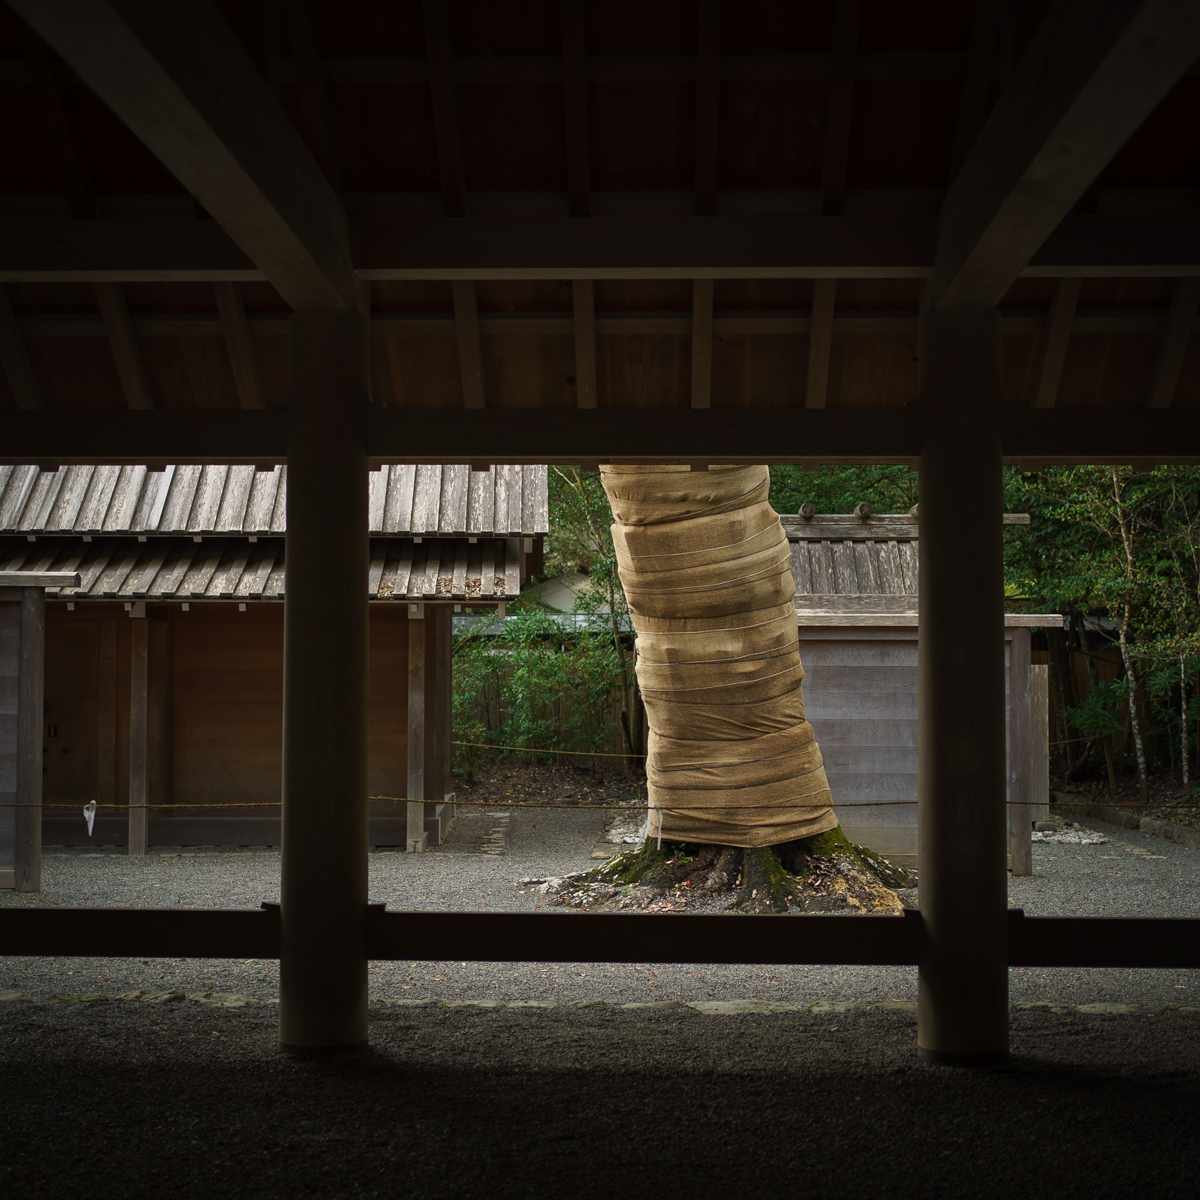 f:id:nagoya-meshi:20191023212110j:plain